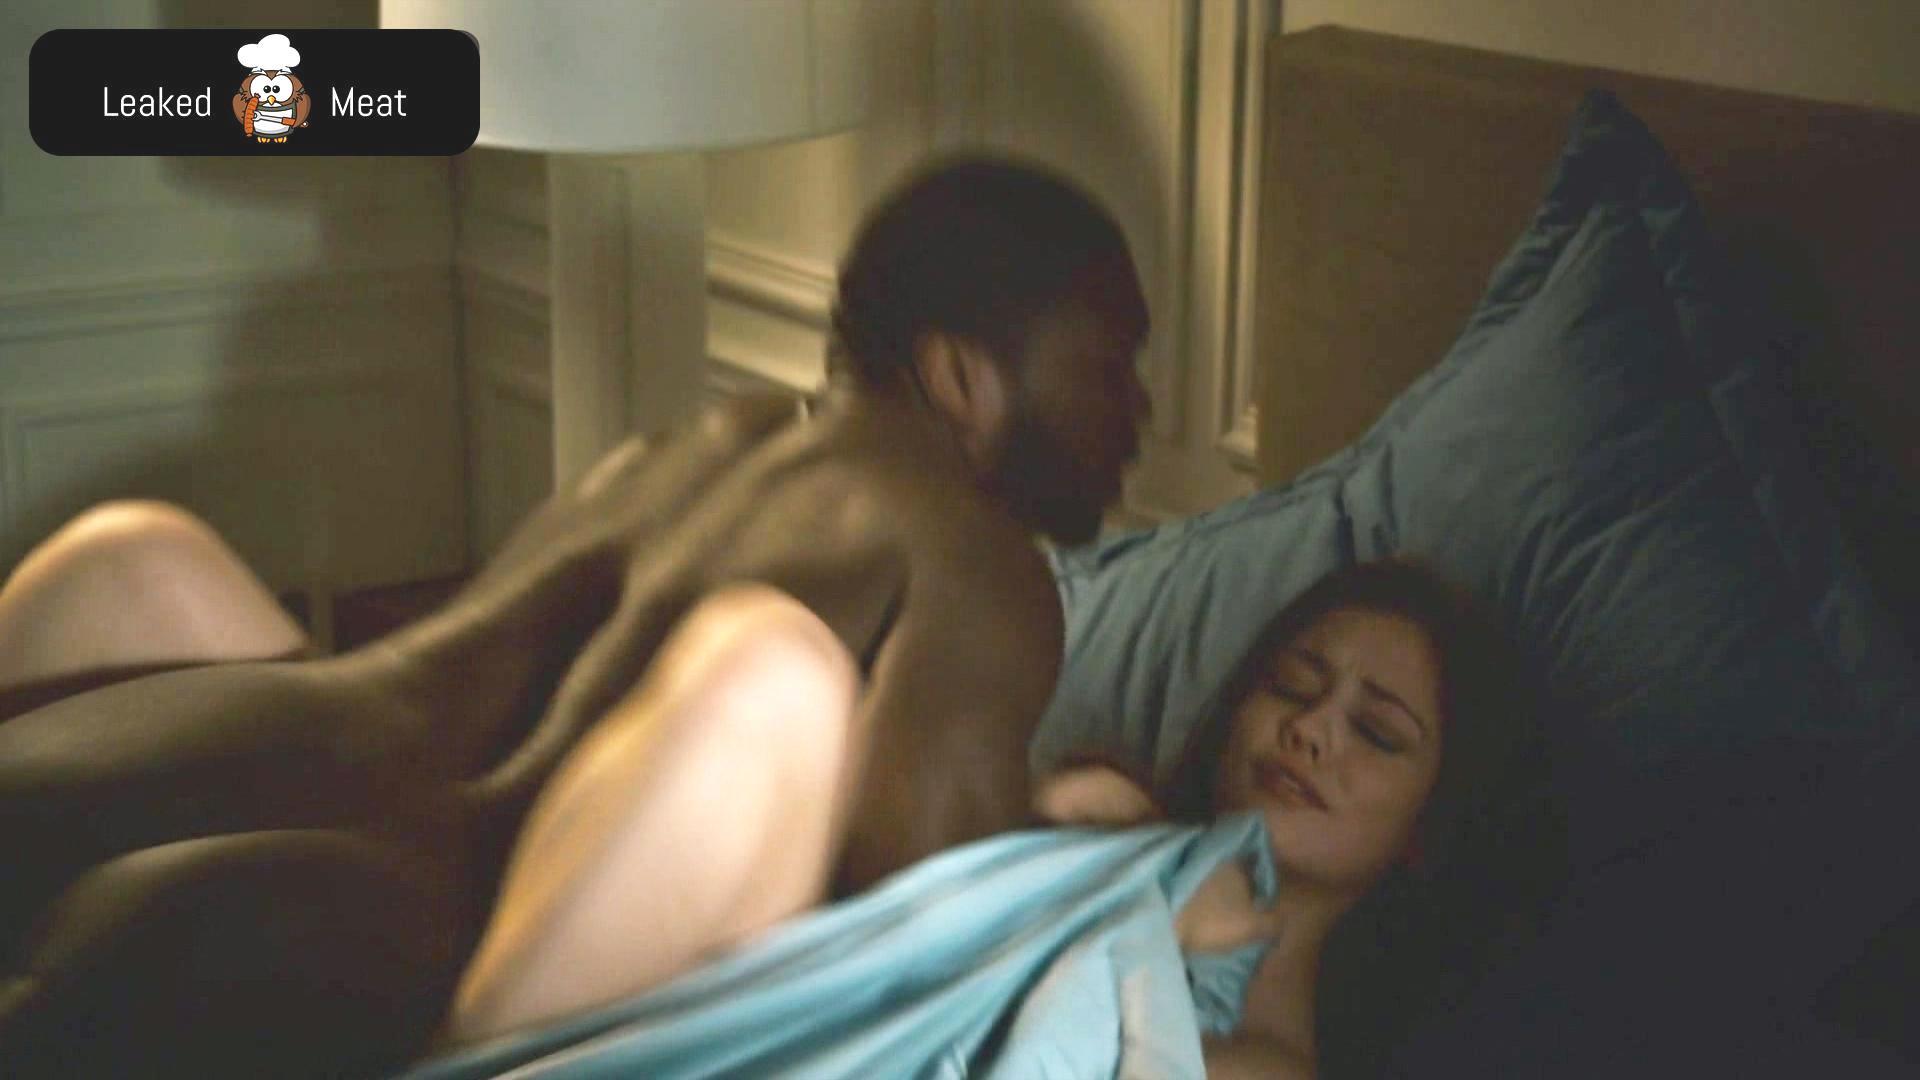 50 Cent | LeakedMeat 27